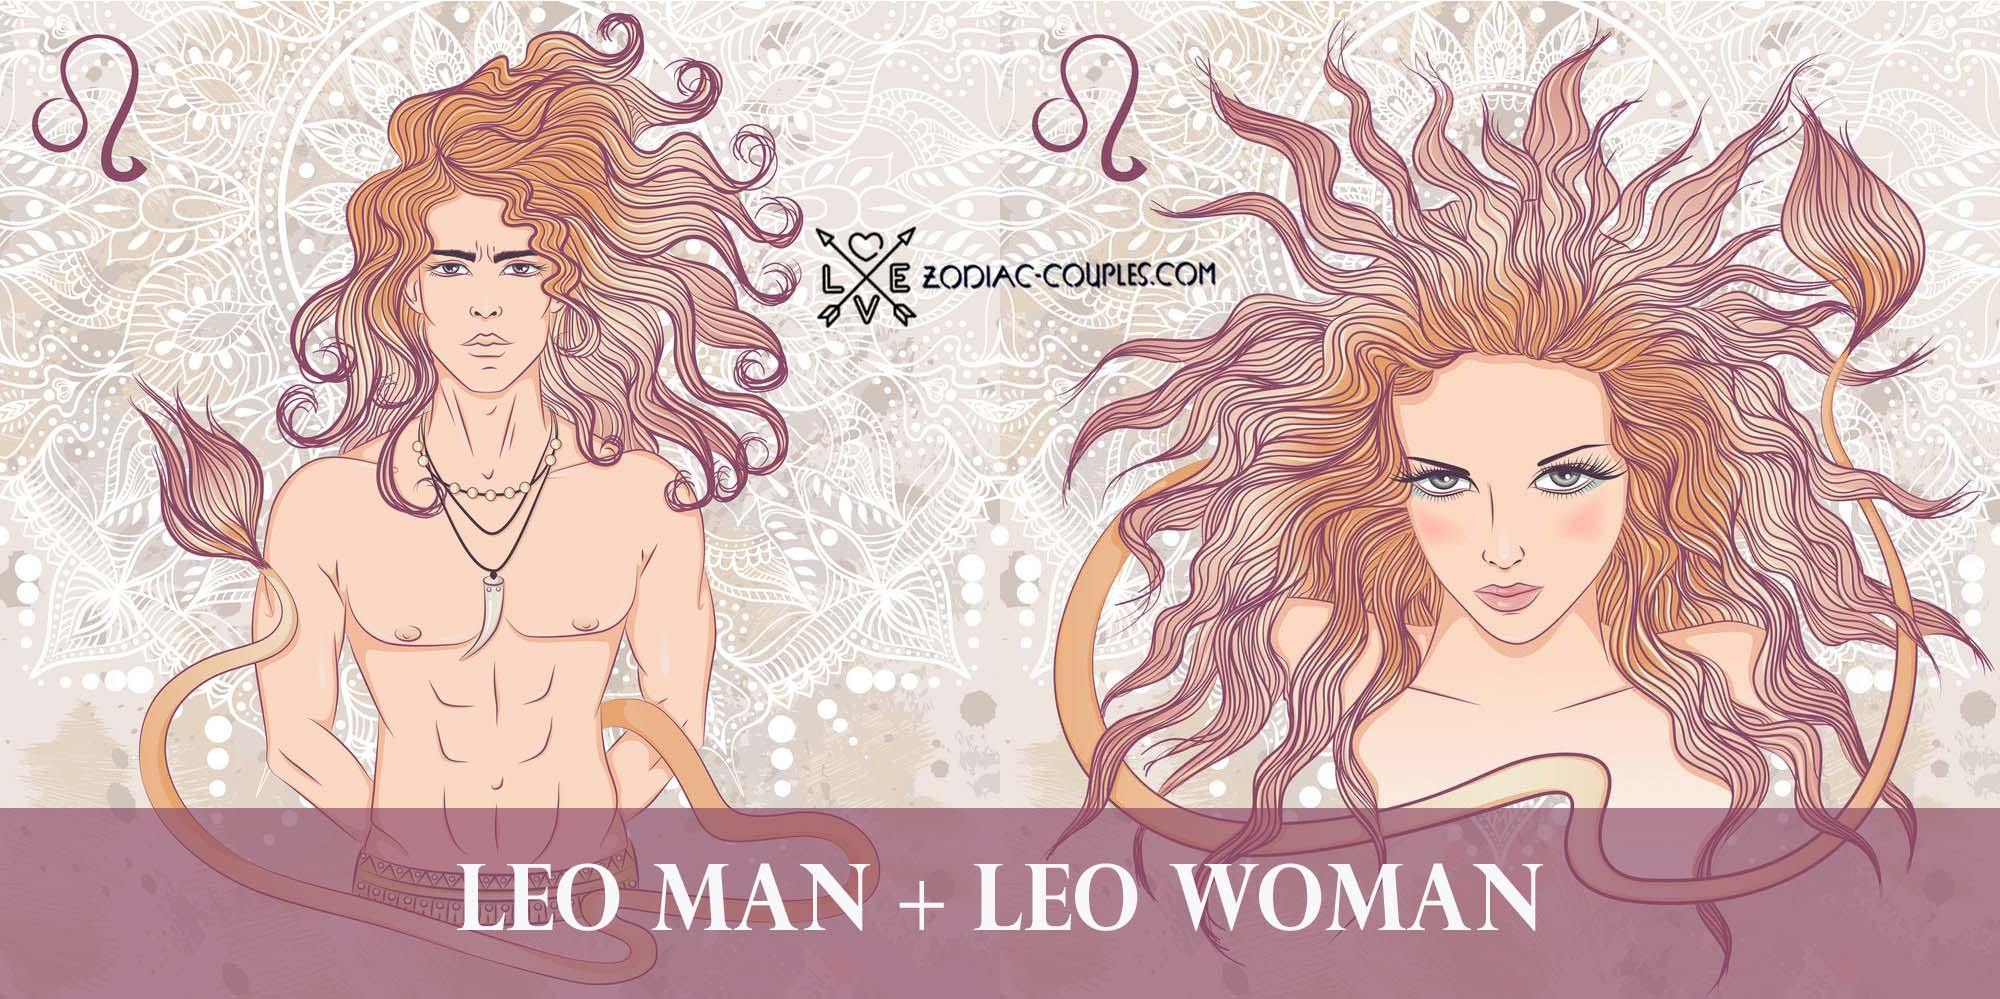 Couples man gemini famous leo woman Leo man